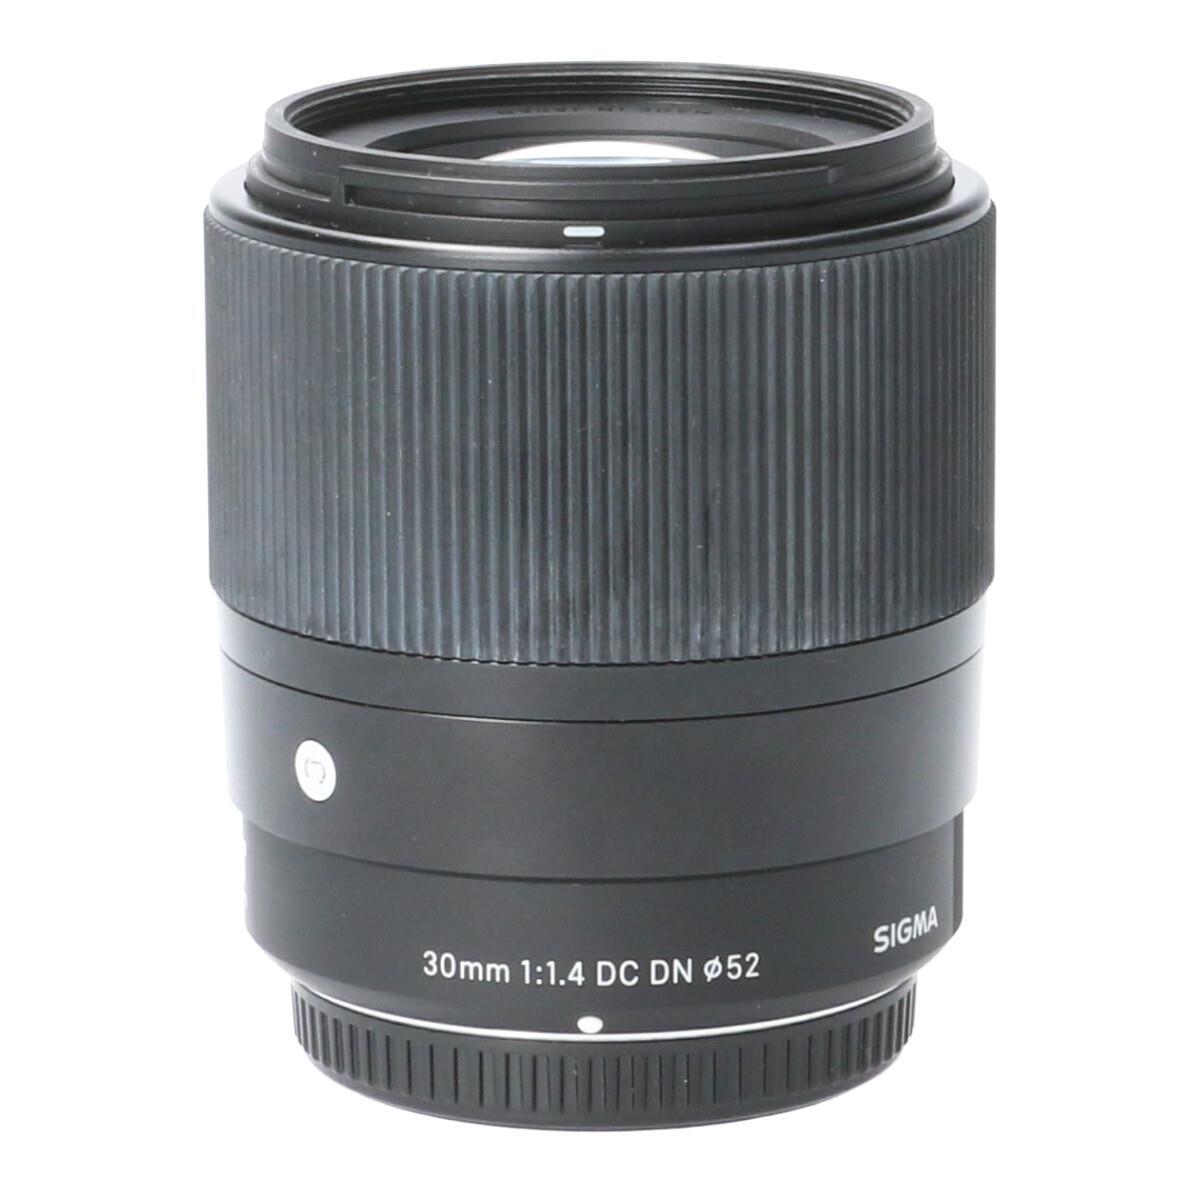 SIGMA MFT30/1.4DC DN(C) MFT(C)30mm F1.4DC DN【中古】